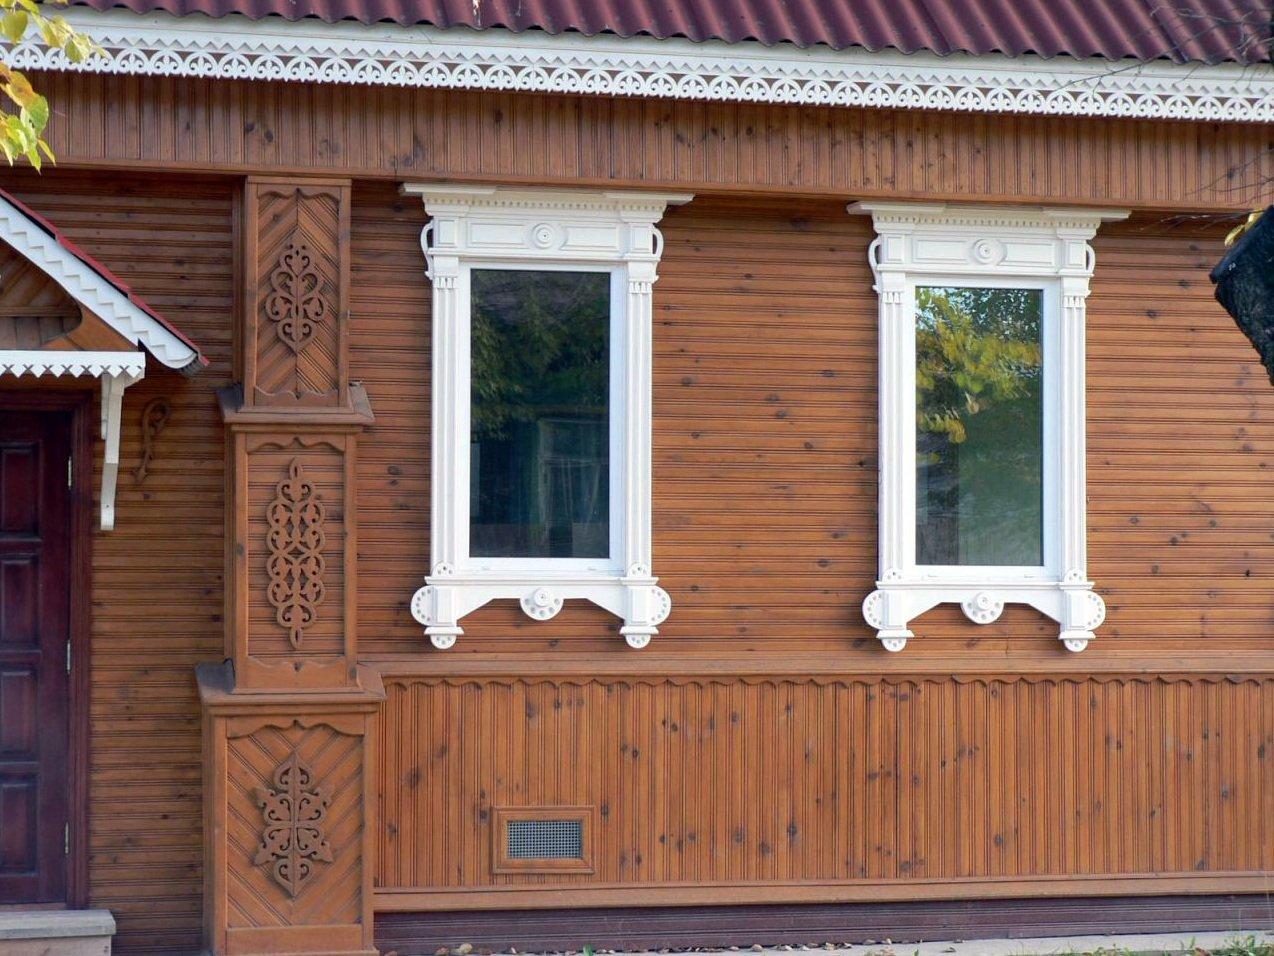 наличники на окна деревянные фото